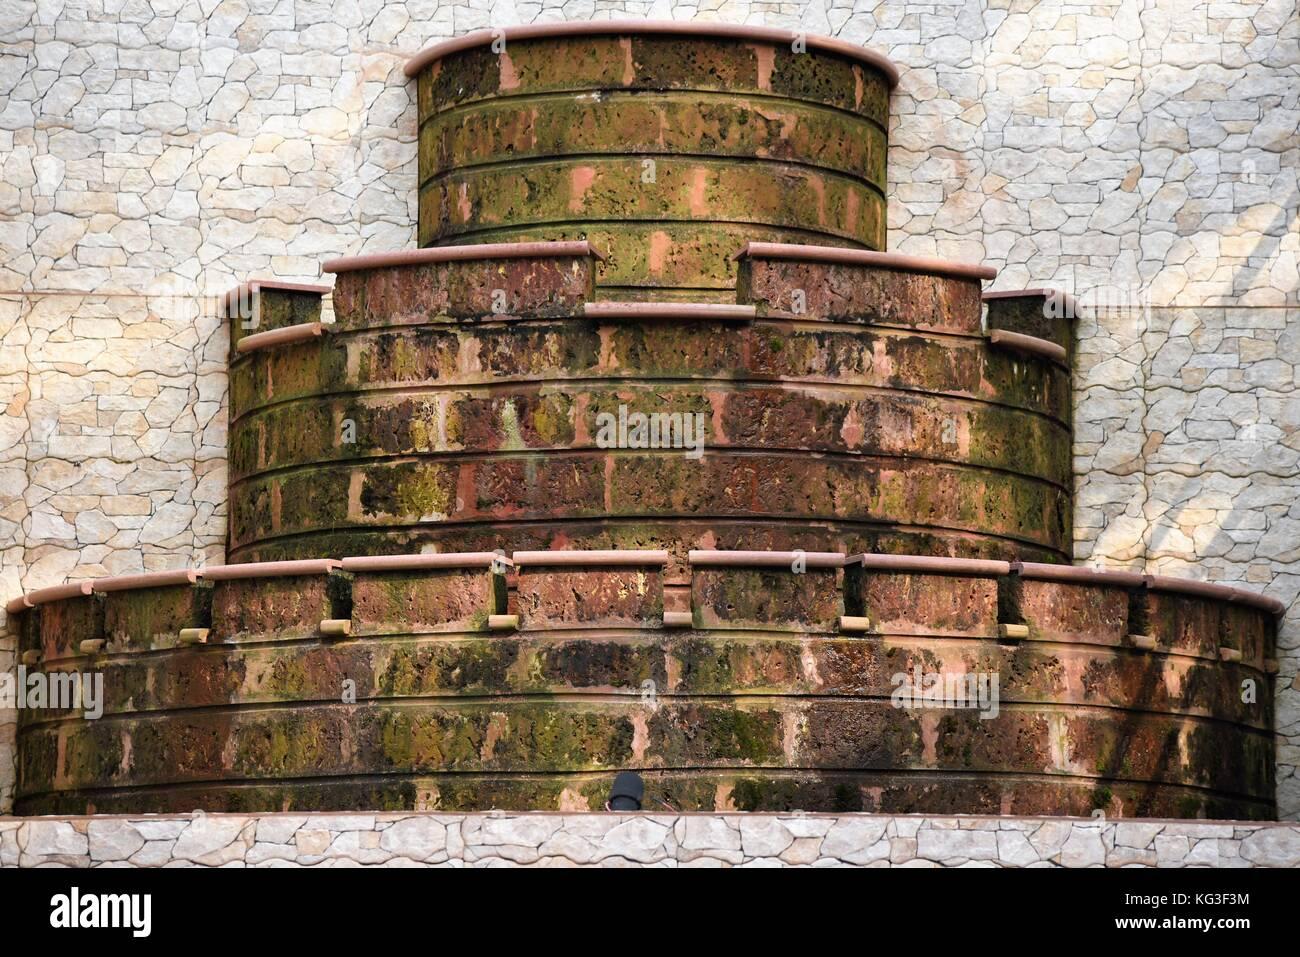 unique rock structure for fountain - Stock Image